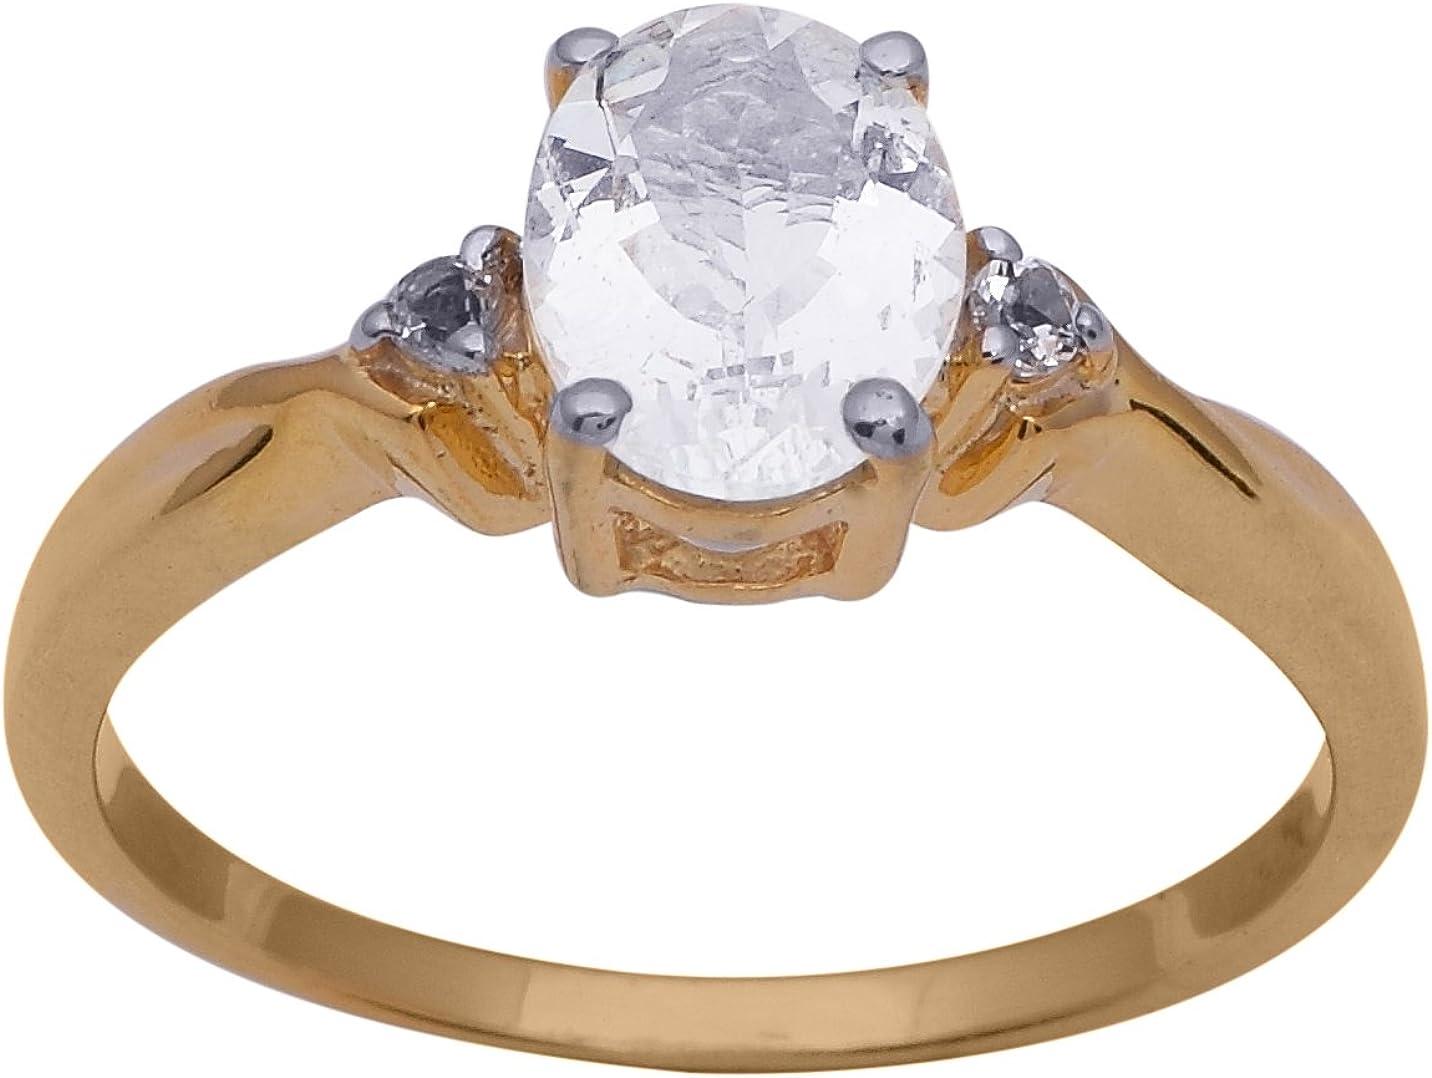 Shine Jewel Calcedonia aguamarina con circonita cúbica piedra preciosa 925 anillo de plata esterlina para mujer